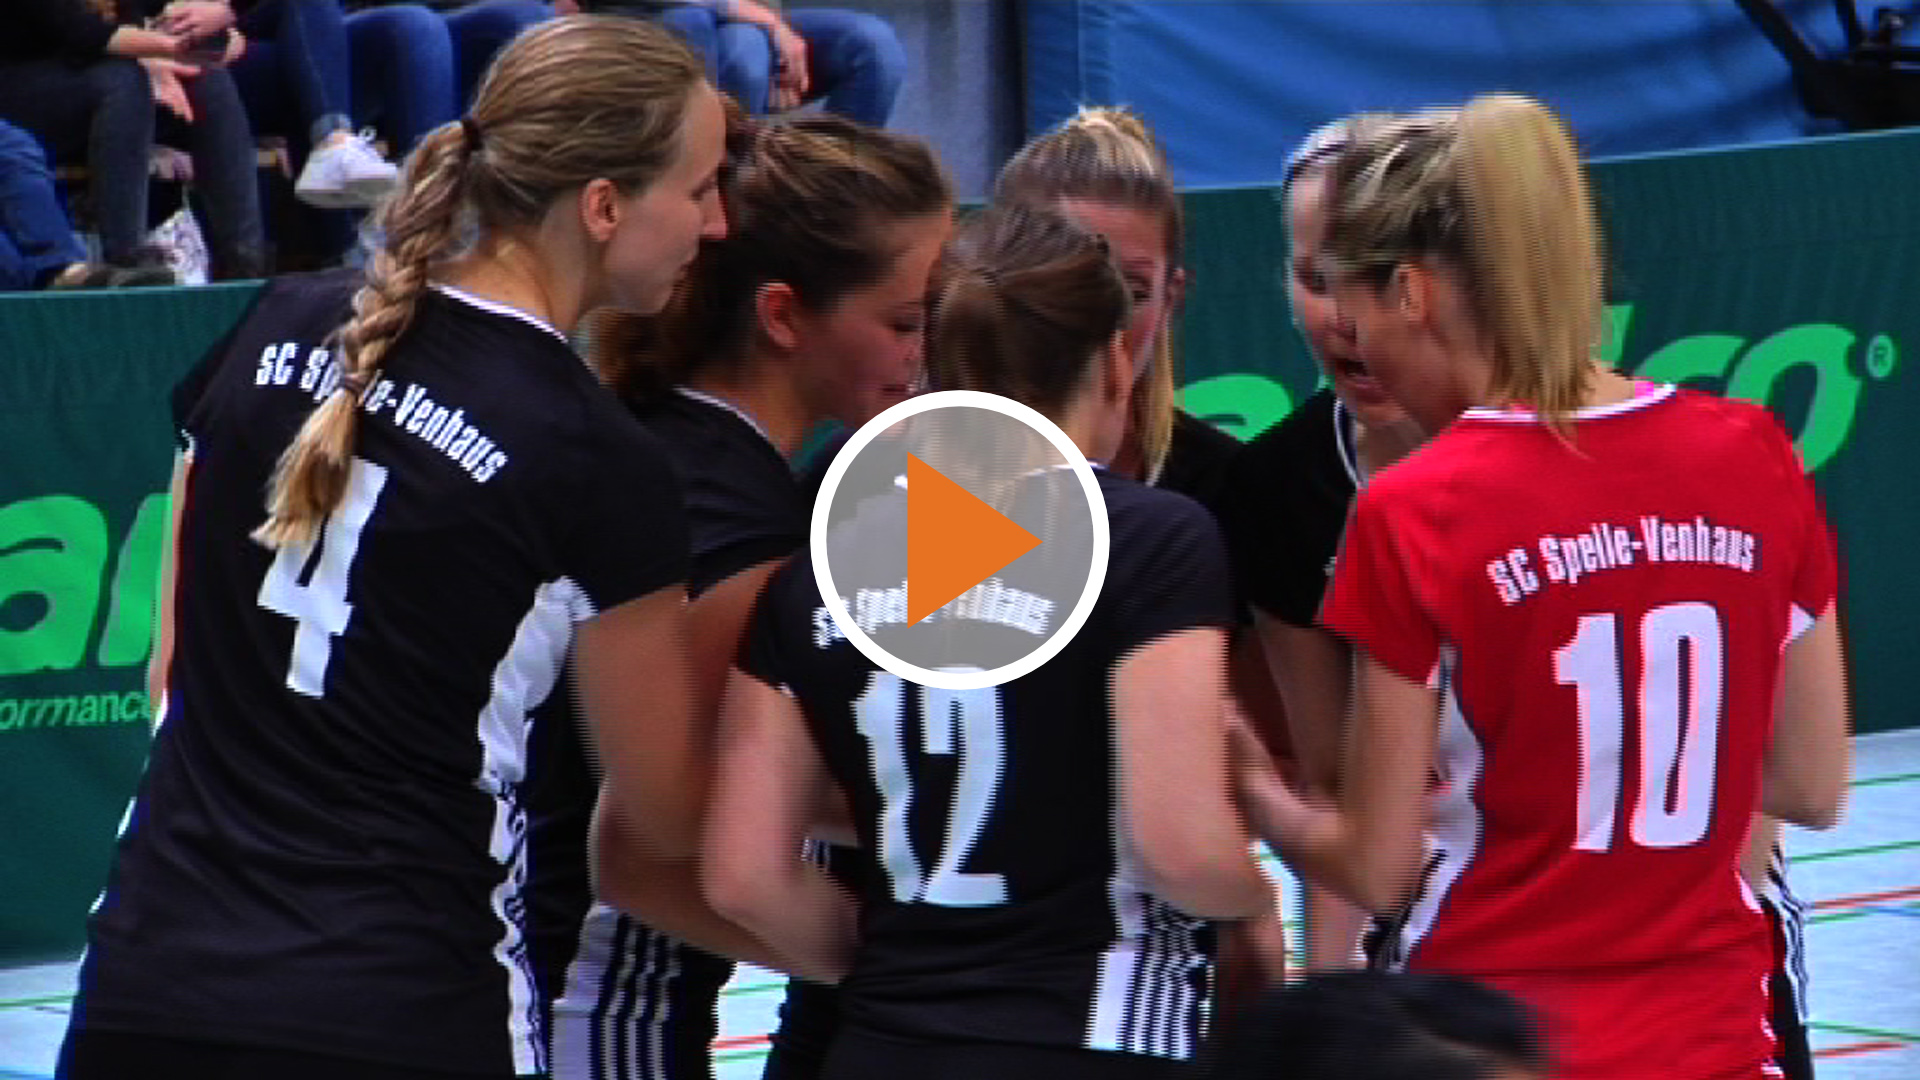 SCREEN_Volleyball Spelle-Köln II